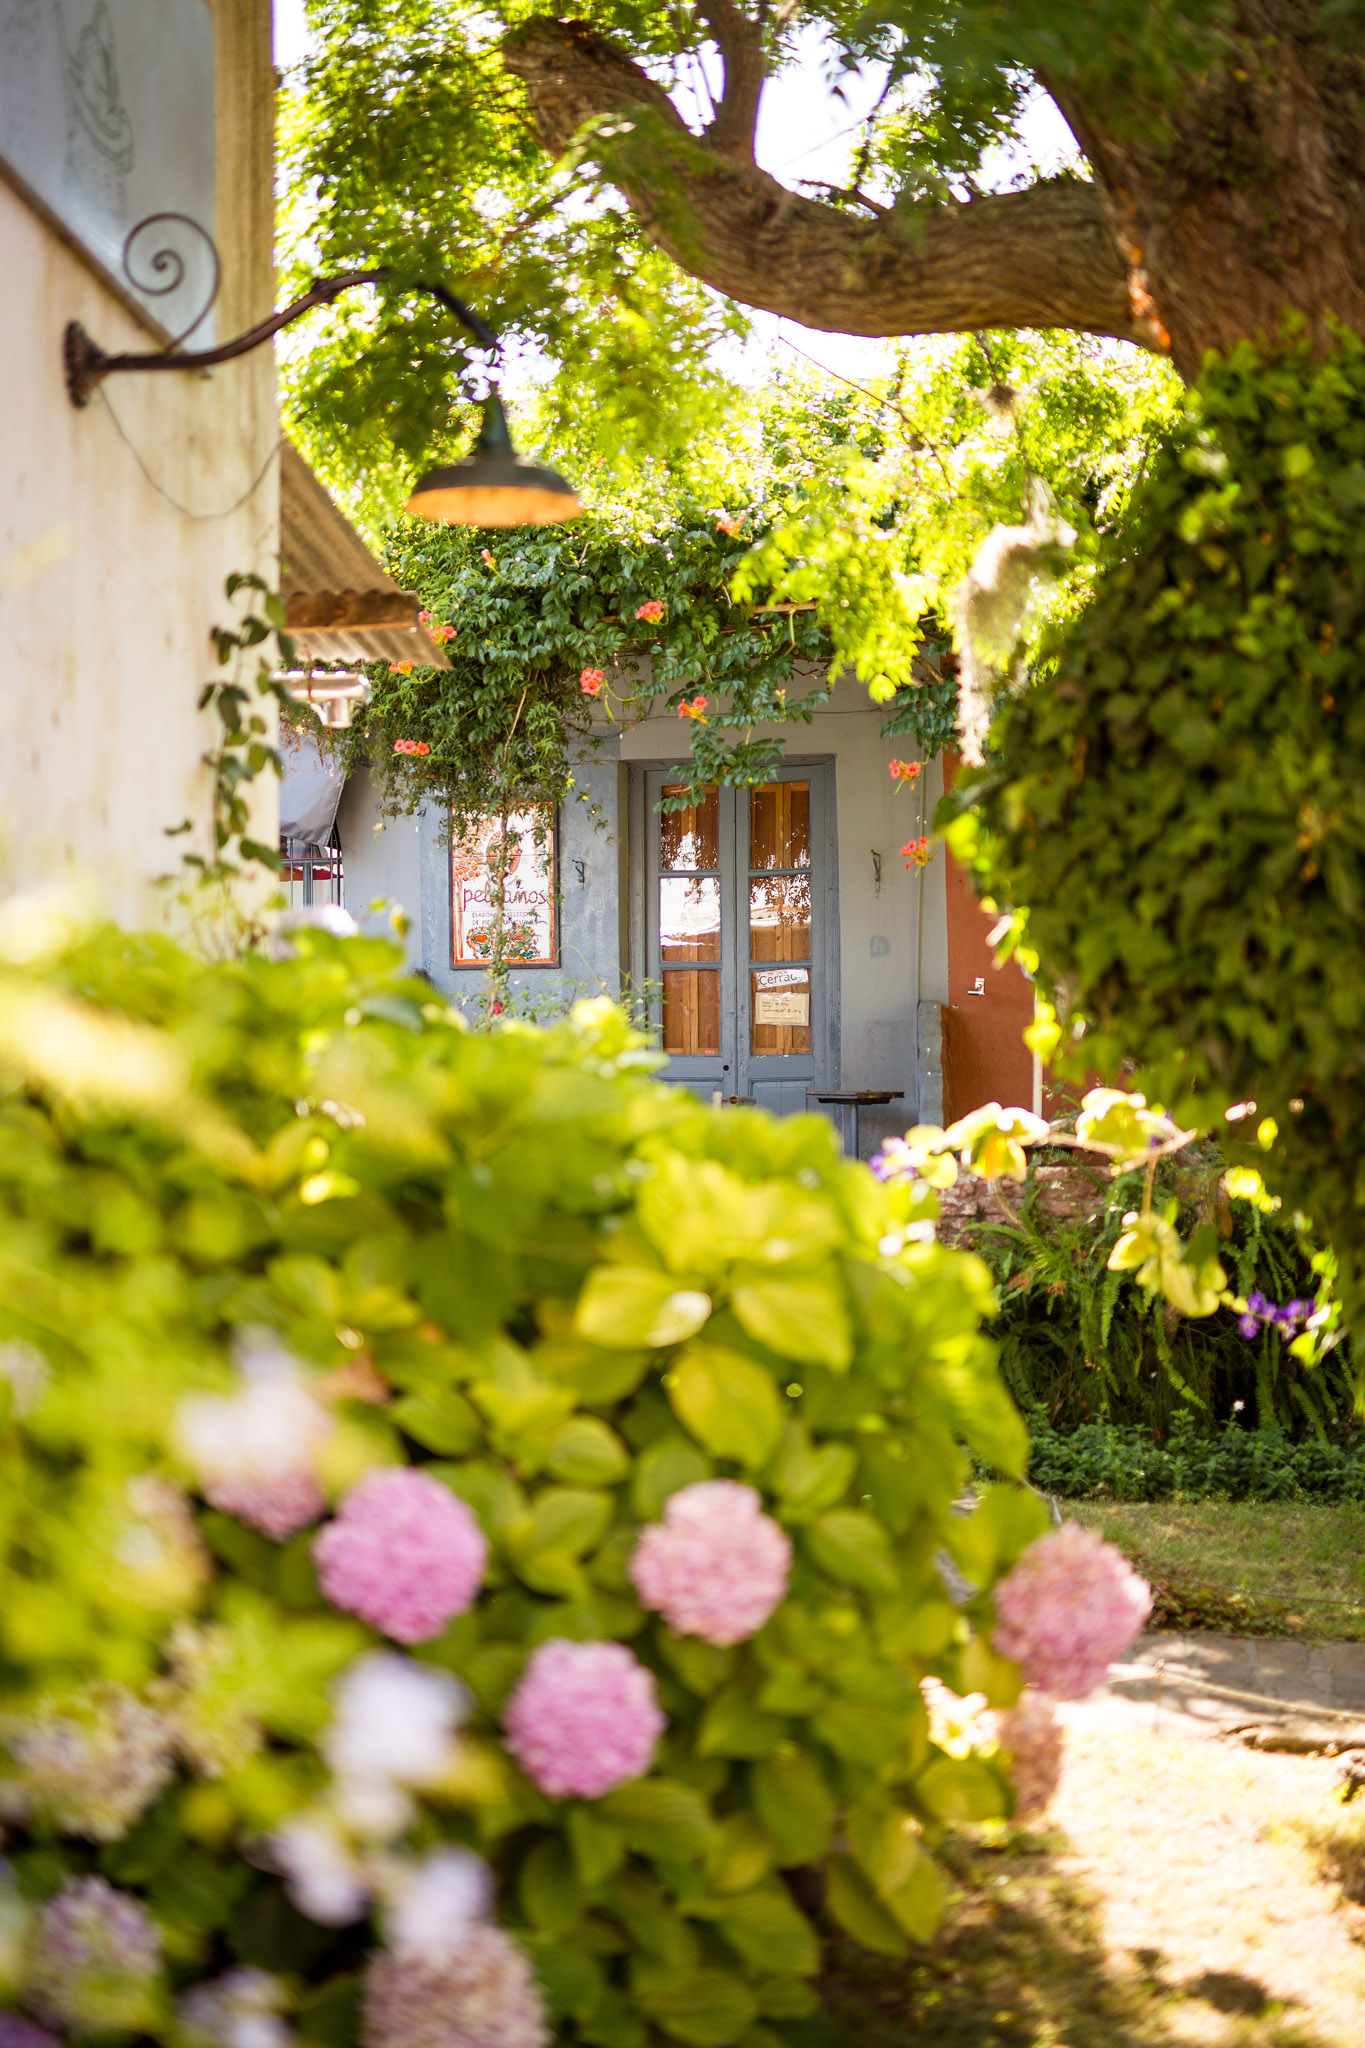 wedding-travellers-destination-photography-overlanding-south-america-uruguay-colonia-del-sacramento-garden